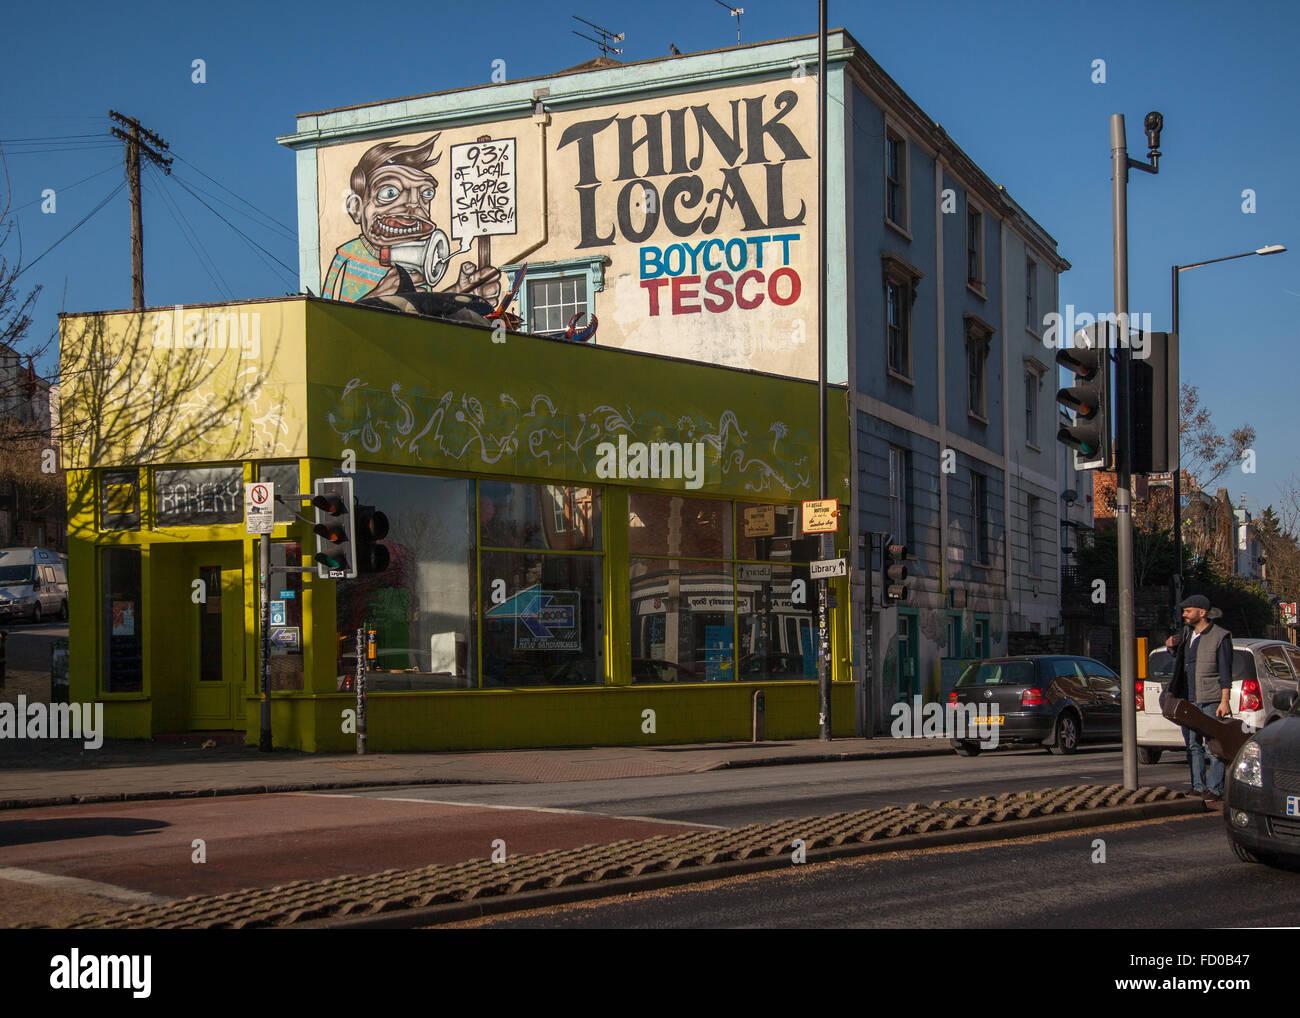 'Boycott Tesco' mural in Stokes Croft, Bristol, England - Stock Image